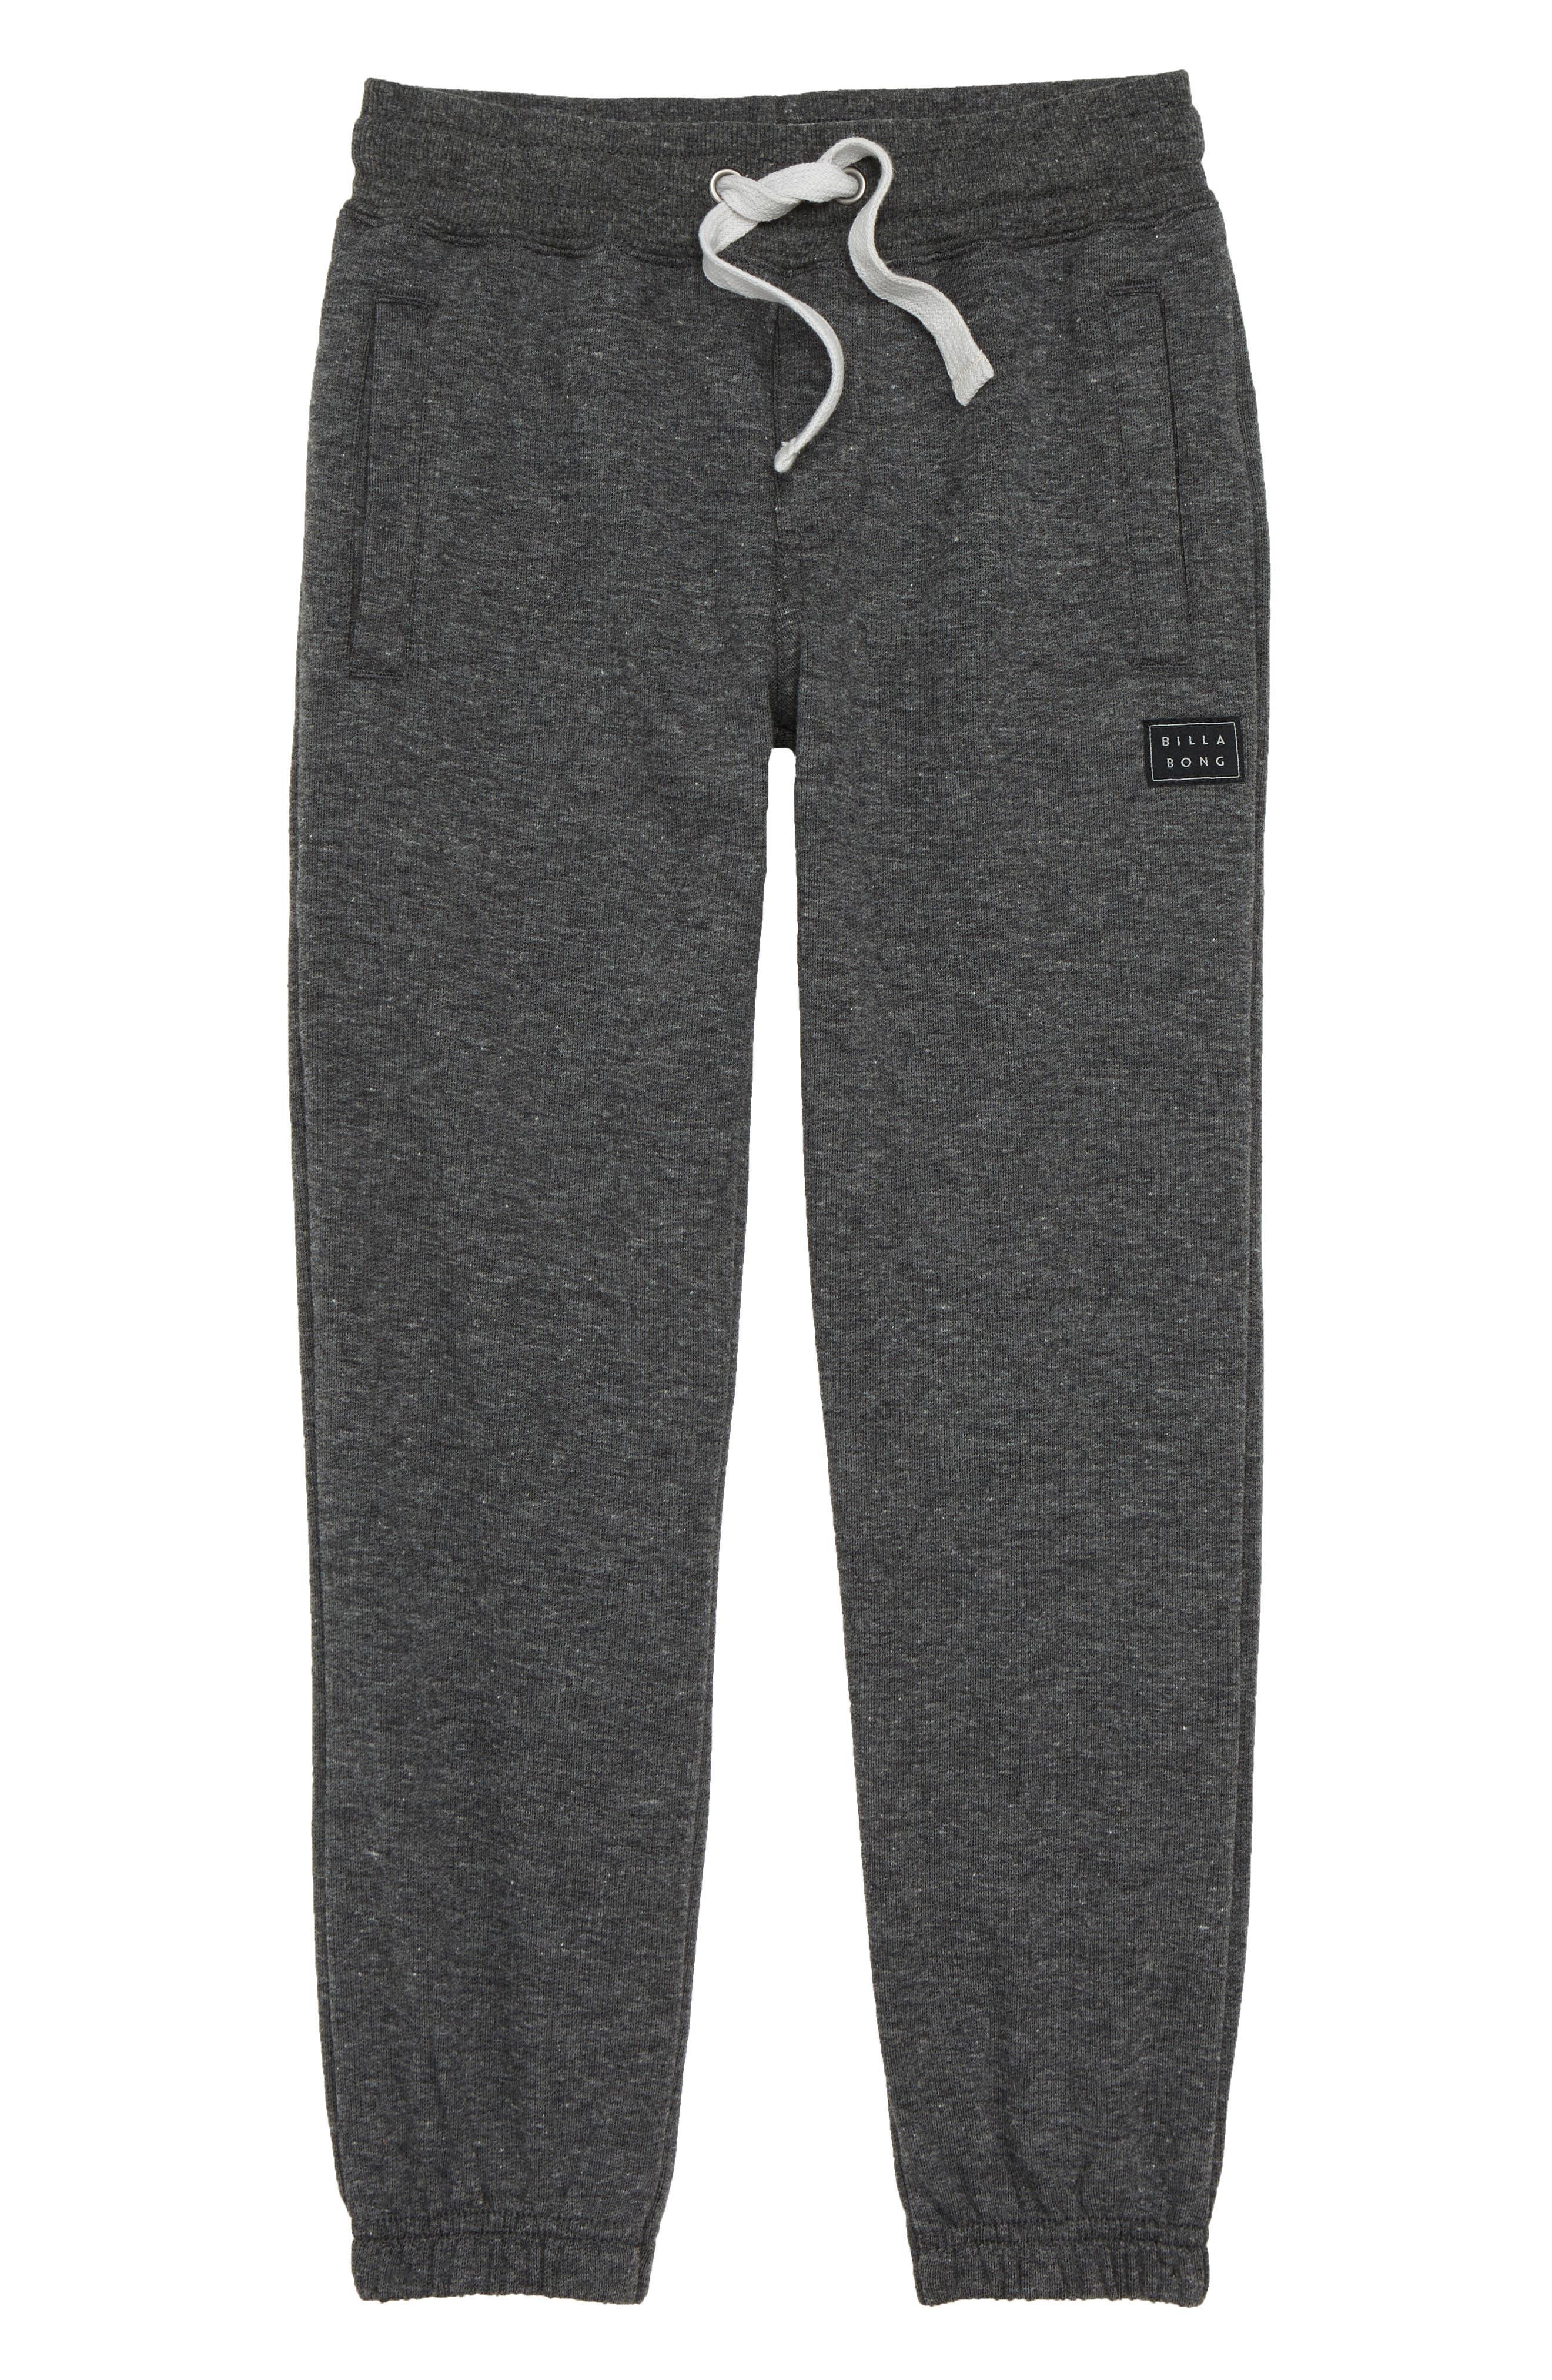 Boys Billabong All Day Sweatpants Size L (1416)  Black